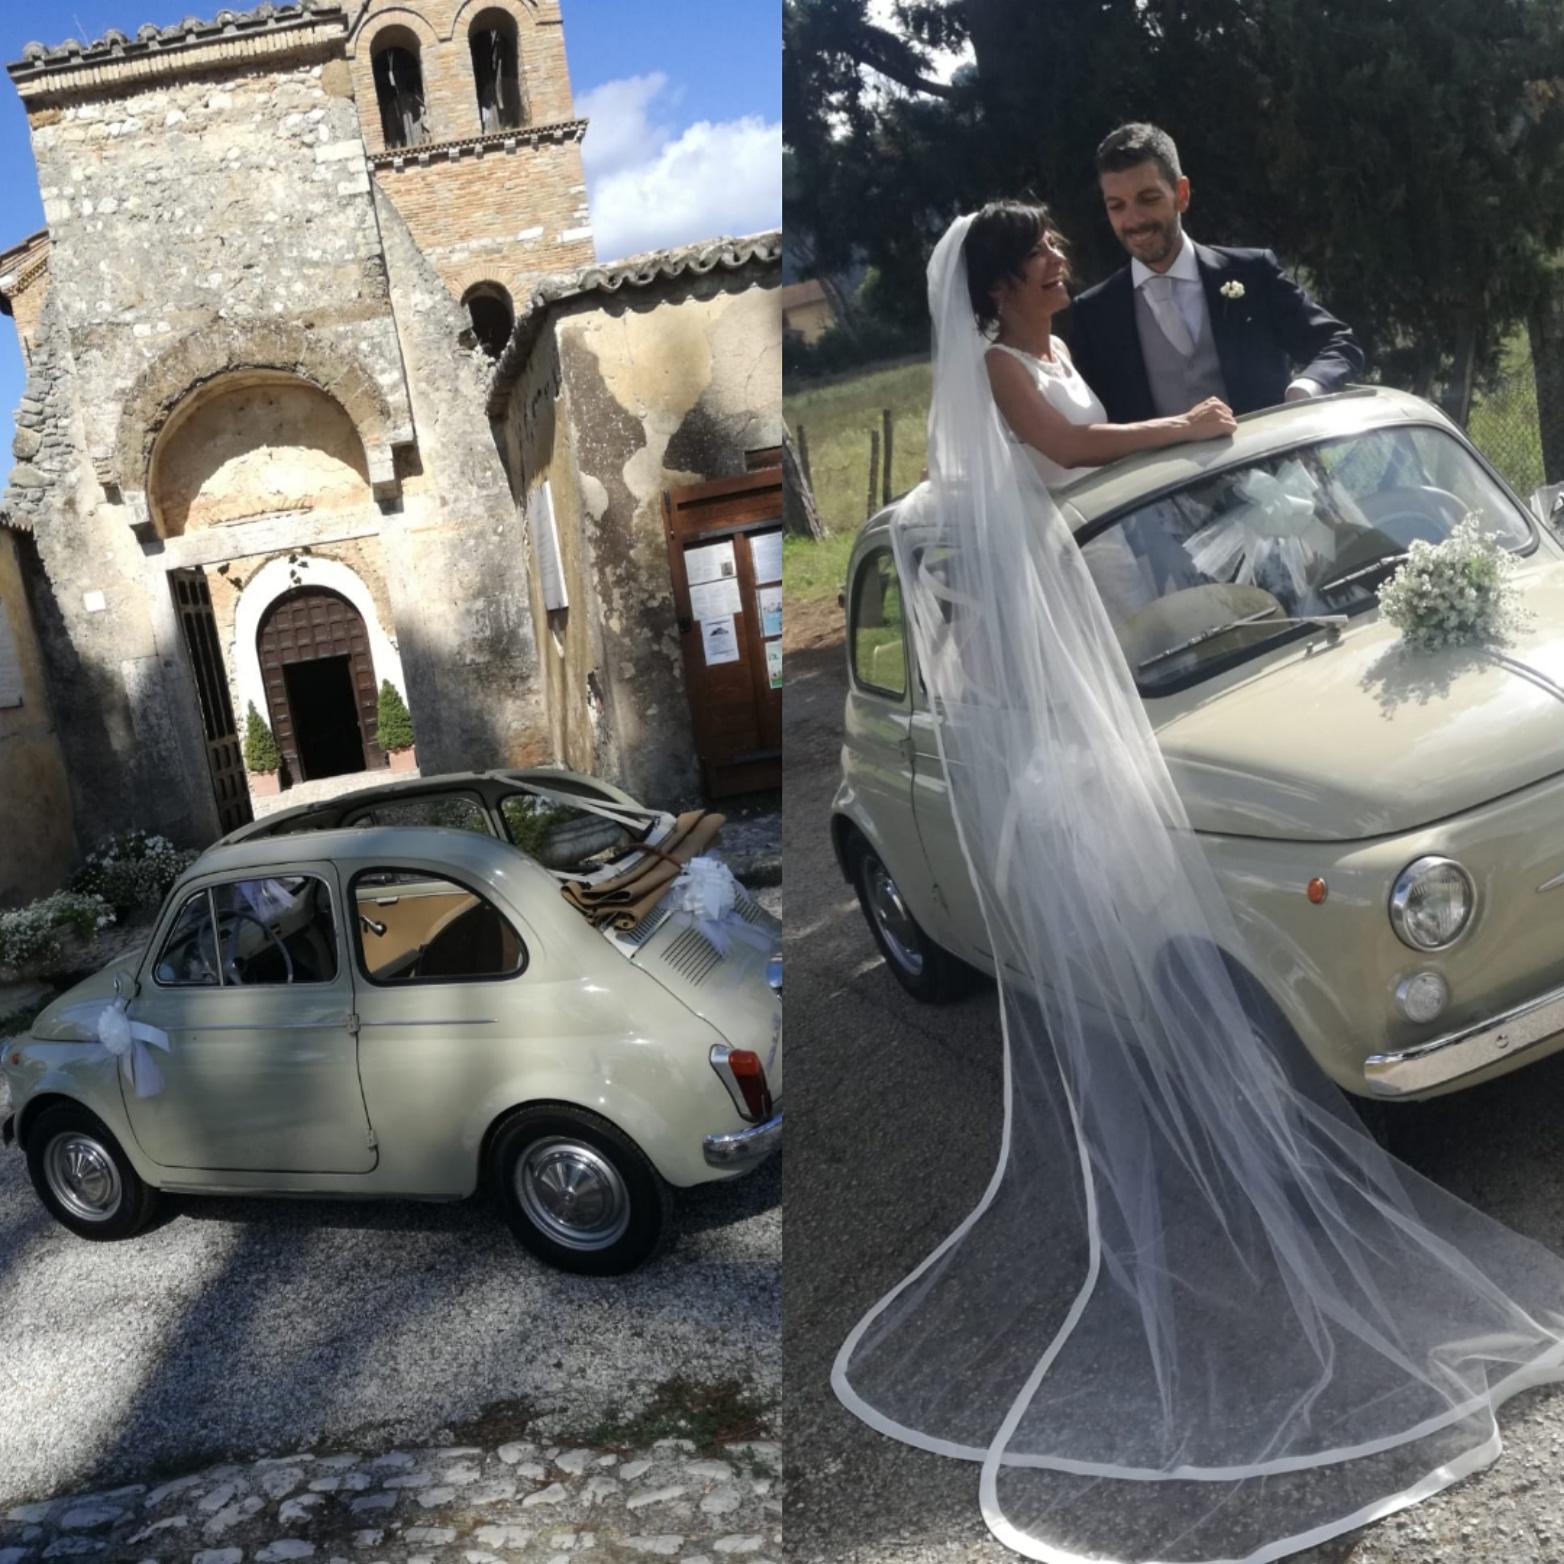 Fiat 500 D - fiat 500 bianca per matrimonio - noleggio auto matrimoni - auto storiche roma - auto d'epoca roma - noleggio auto d'epoca matrimoni roma - Noleggio Auto matrimoni - nozze auto - auto matrimonio Roma